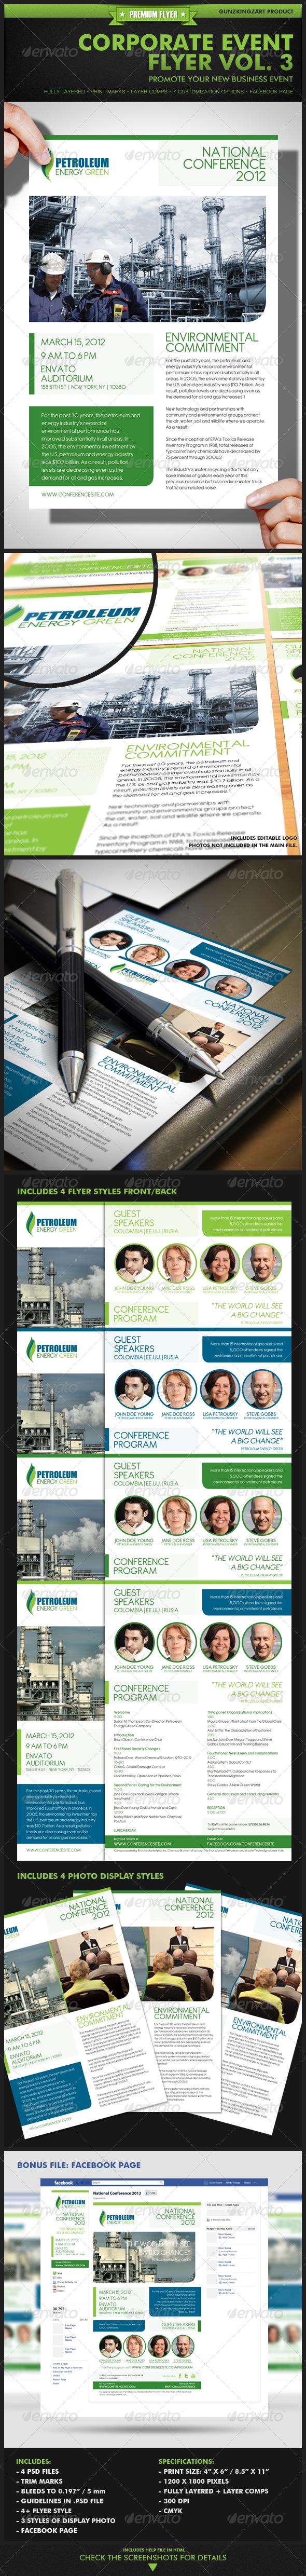 Corporate Event Flyer Vol. 3  - Corporate Flyers